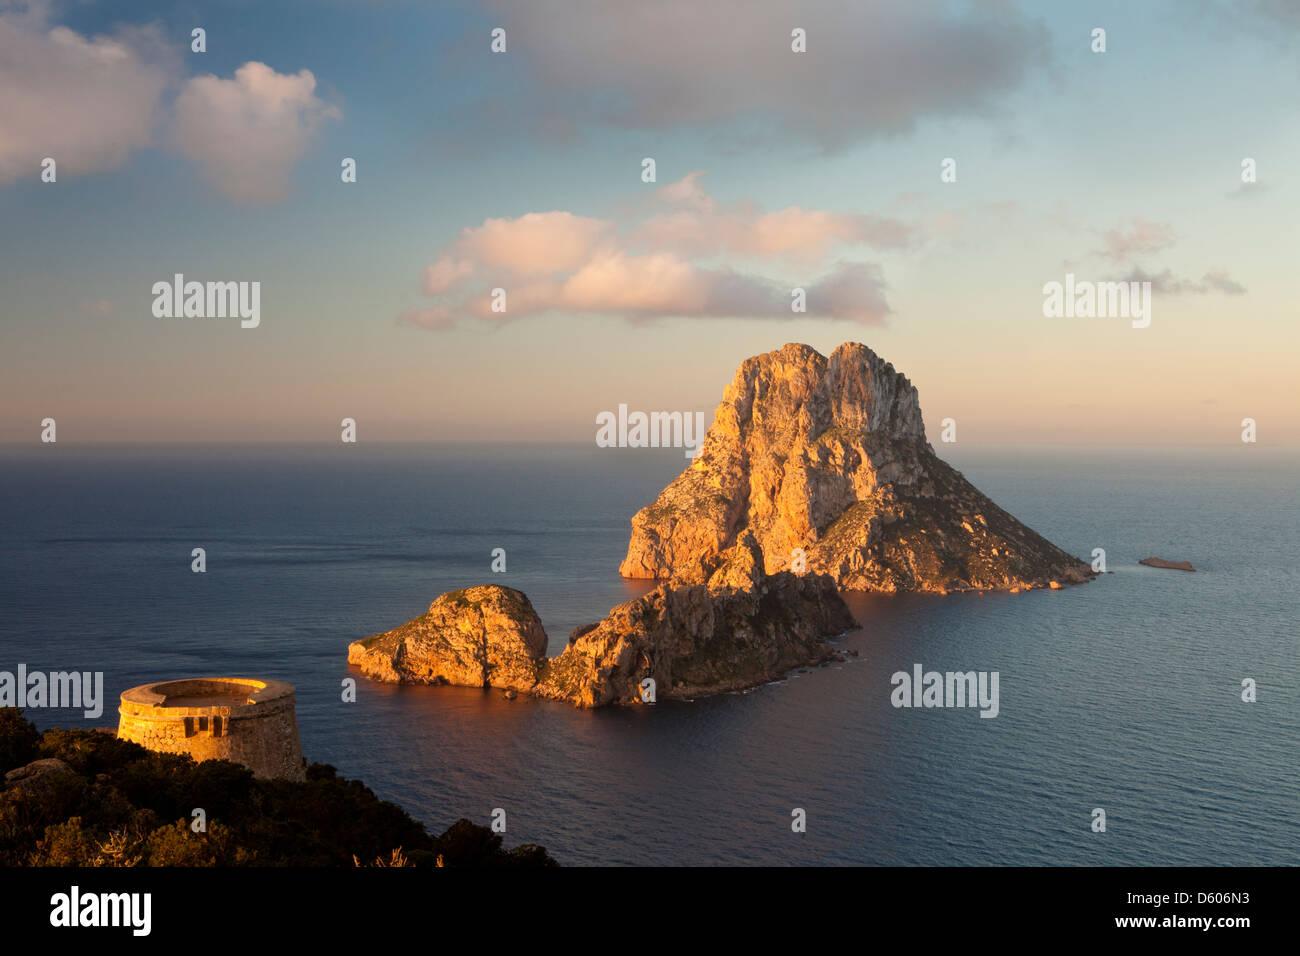 Es Vedrà and Es Vedranell islots from Torre des Savinar, Sant Josep de Sa Talaia, Ibiza, Illes Balears, Spain Stock Photo